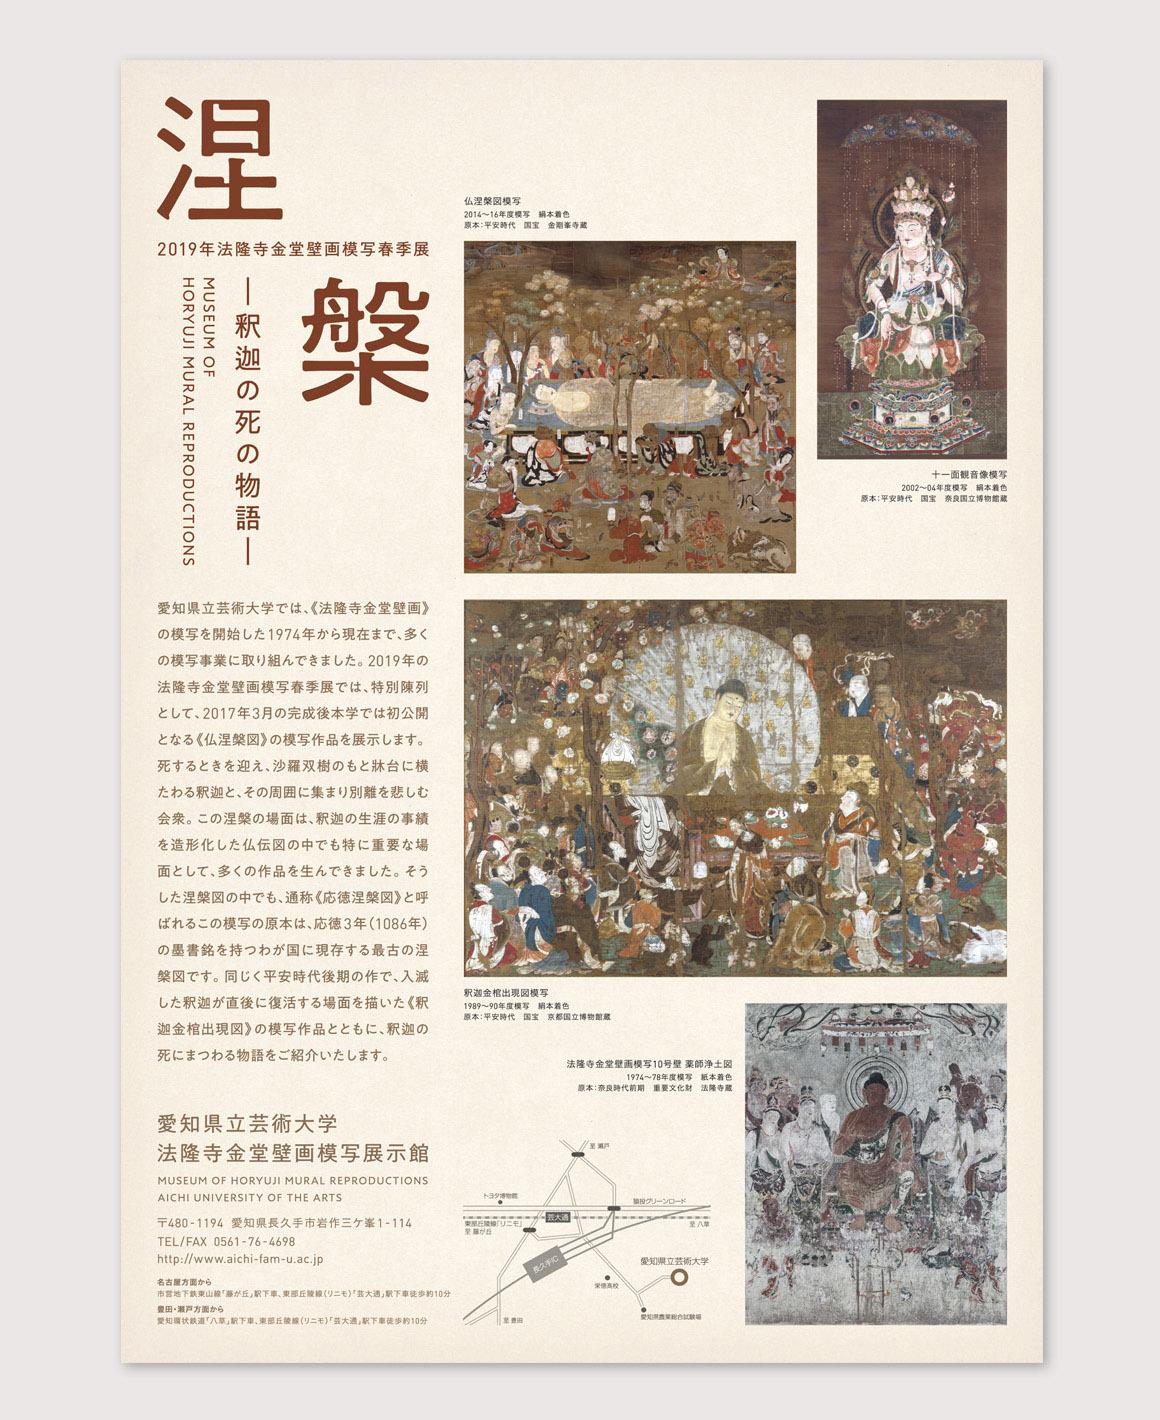 WORKS|涅槃―釈迦の死の物語―_e0206124_16234023.jpg